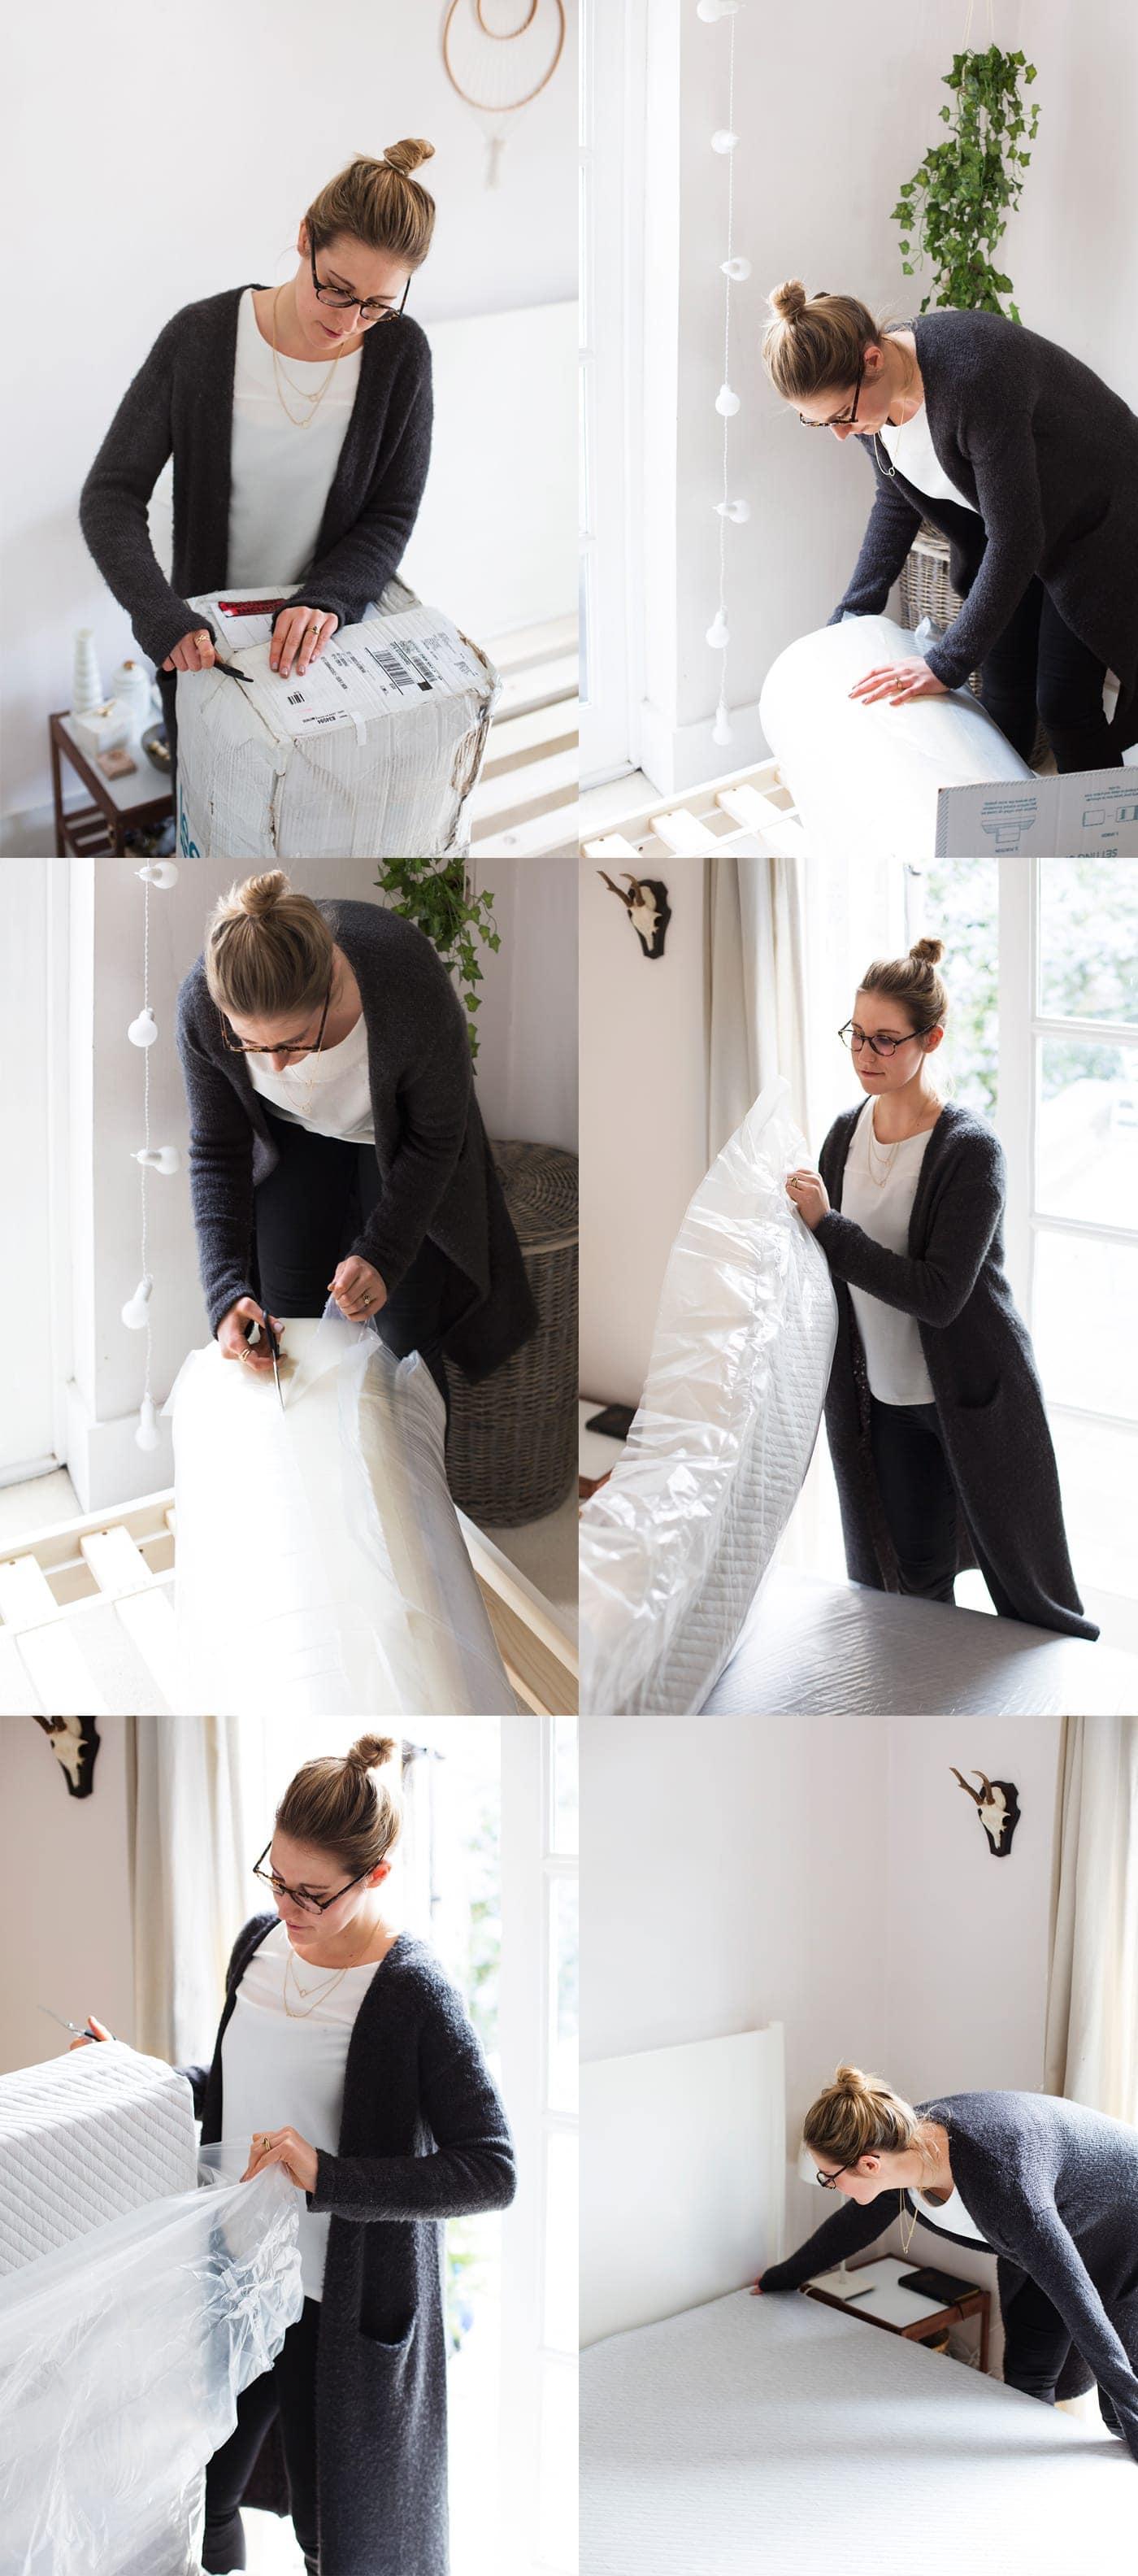 Leesa mattress easy unpacking